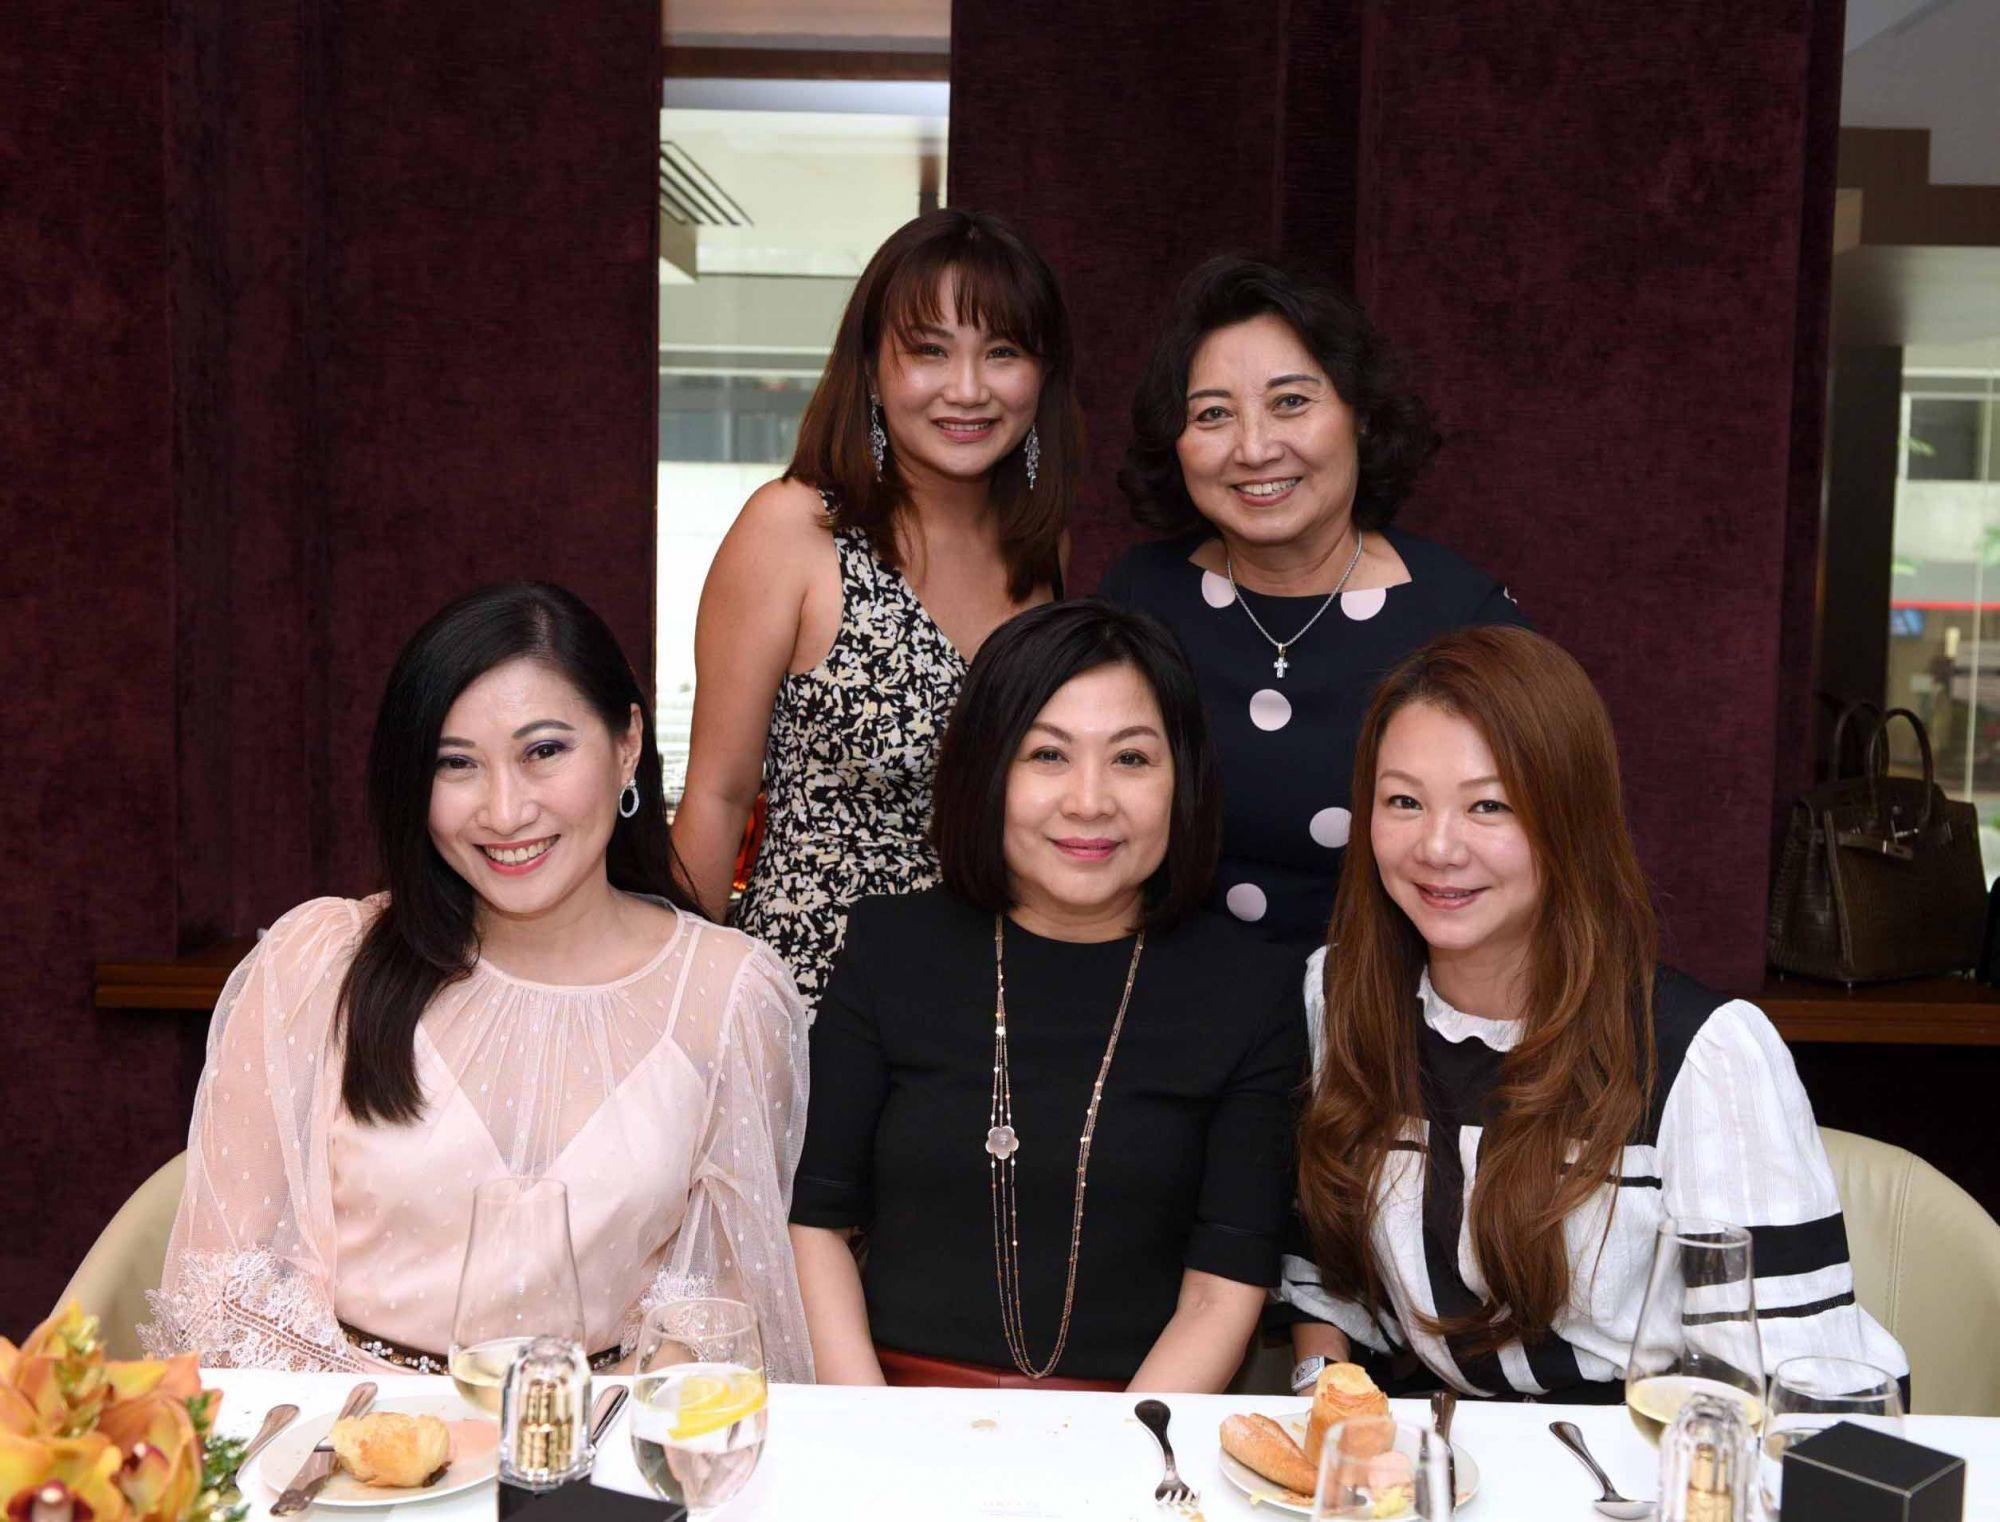 Tan Khar Nai, Selina Low, Llilian Low, Kristine Goh, Angela Ng